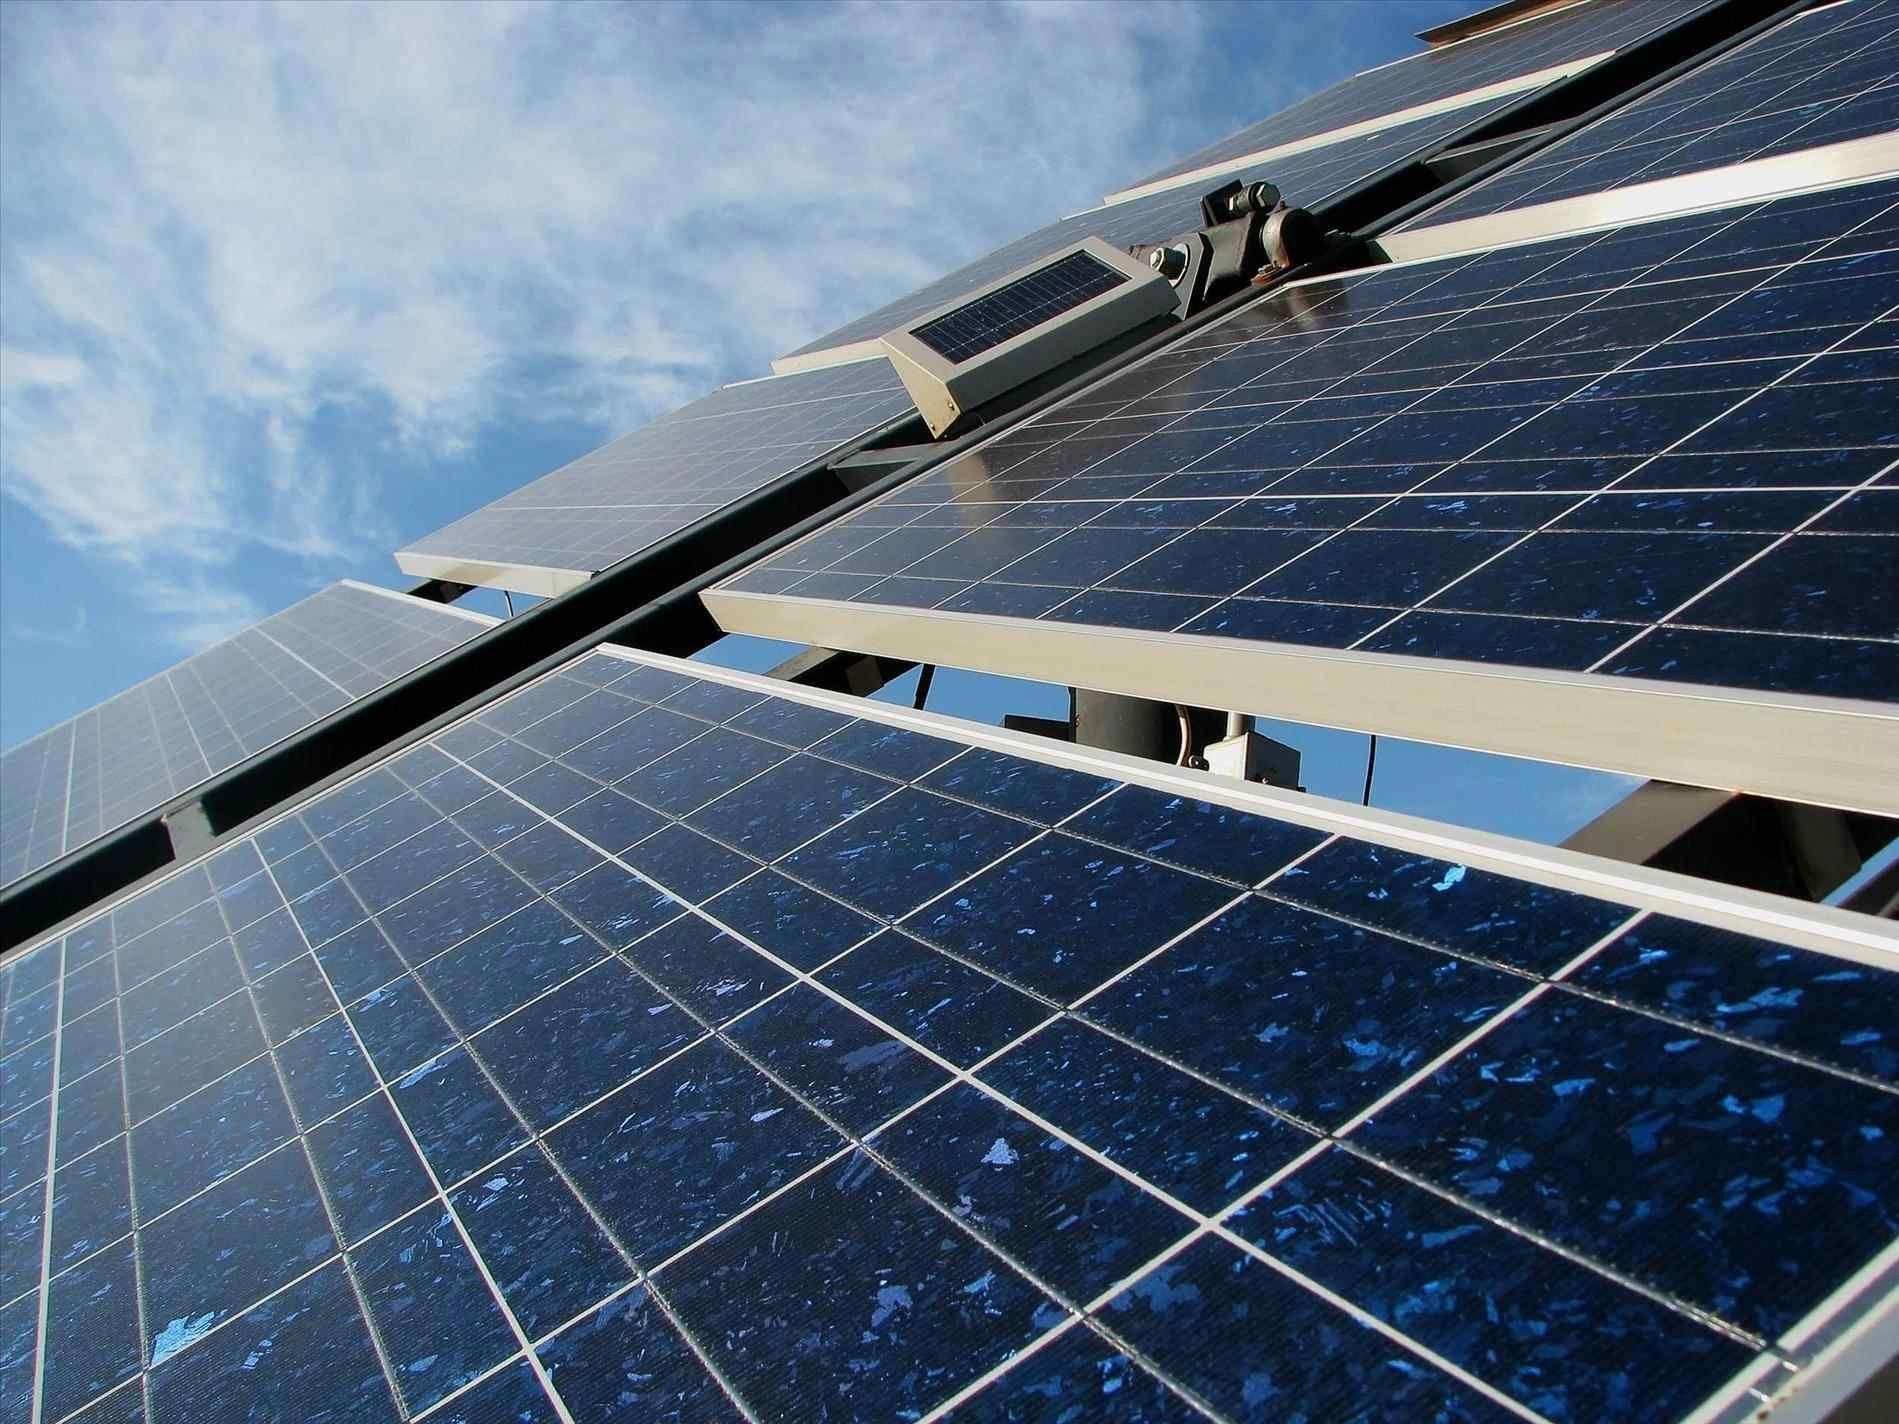 Rack Mounted Solar Panels Modules Solar Roofing How Do The Solar Panels Work Solar Panel Roof Tiles And Solar Powered In 2020 Solar Solar Panels Roof Solar Panels